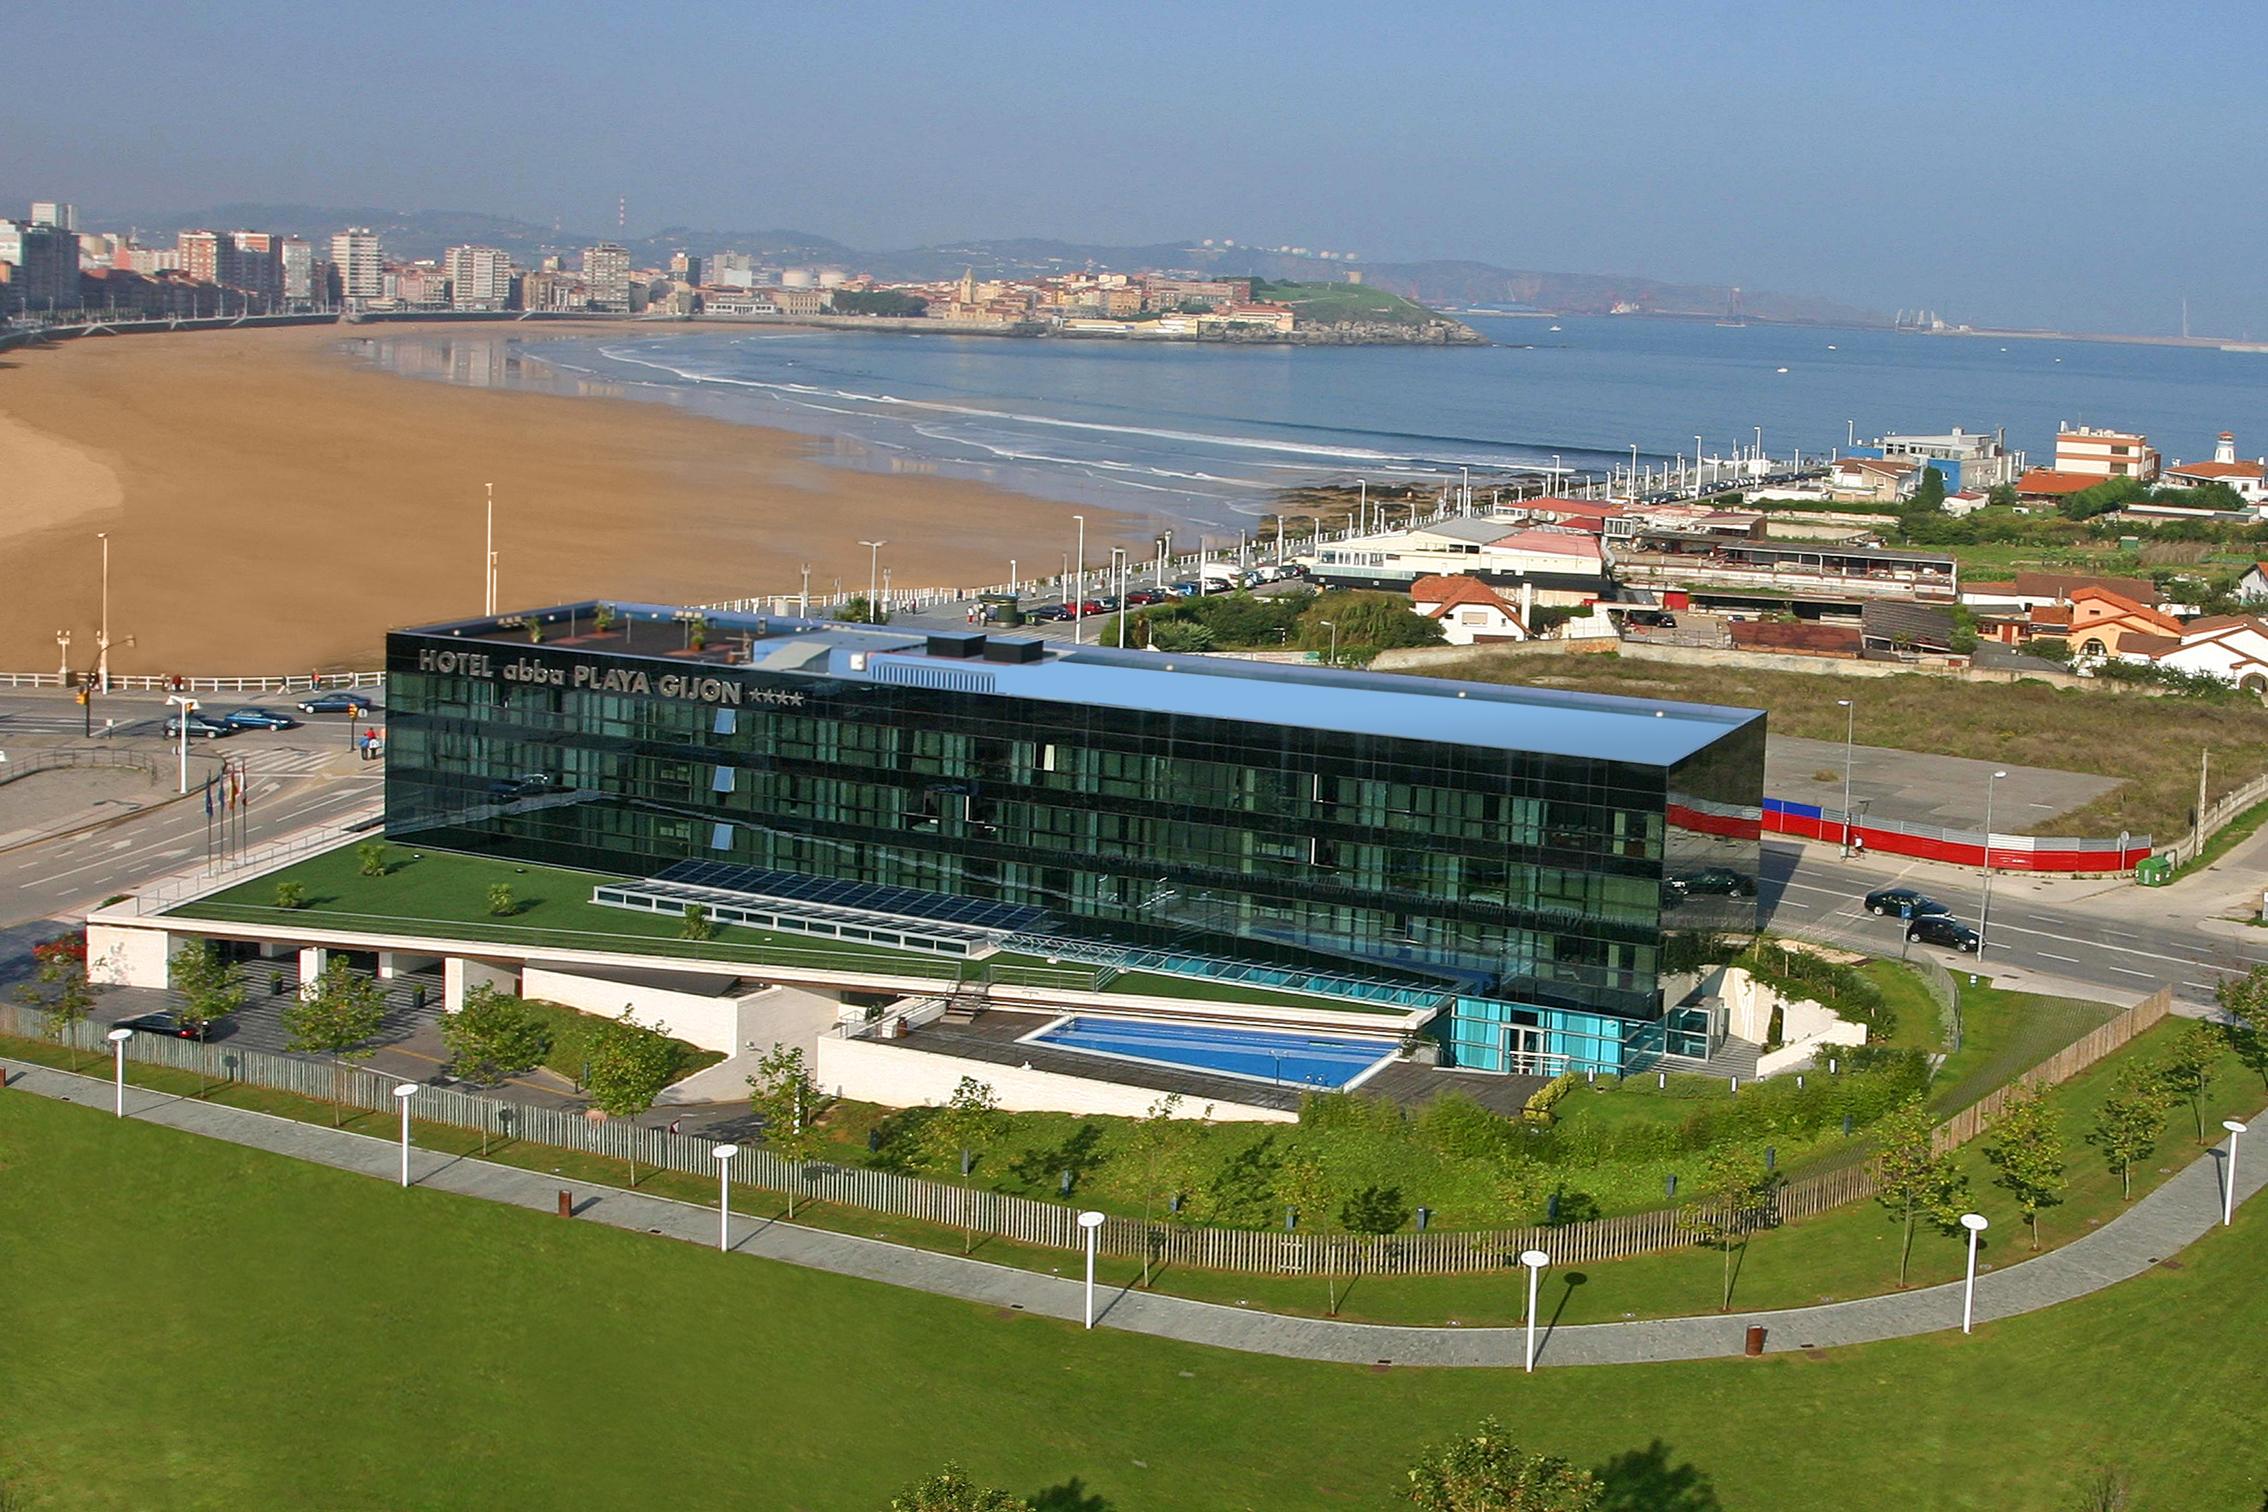 Hotel ABBA Playa Gijón 4*